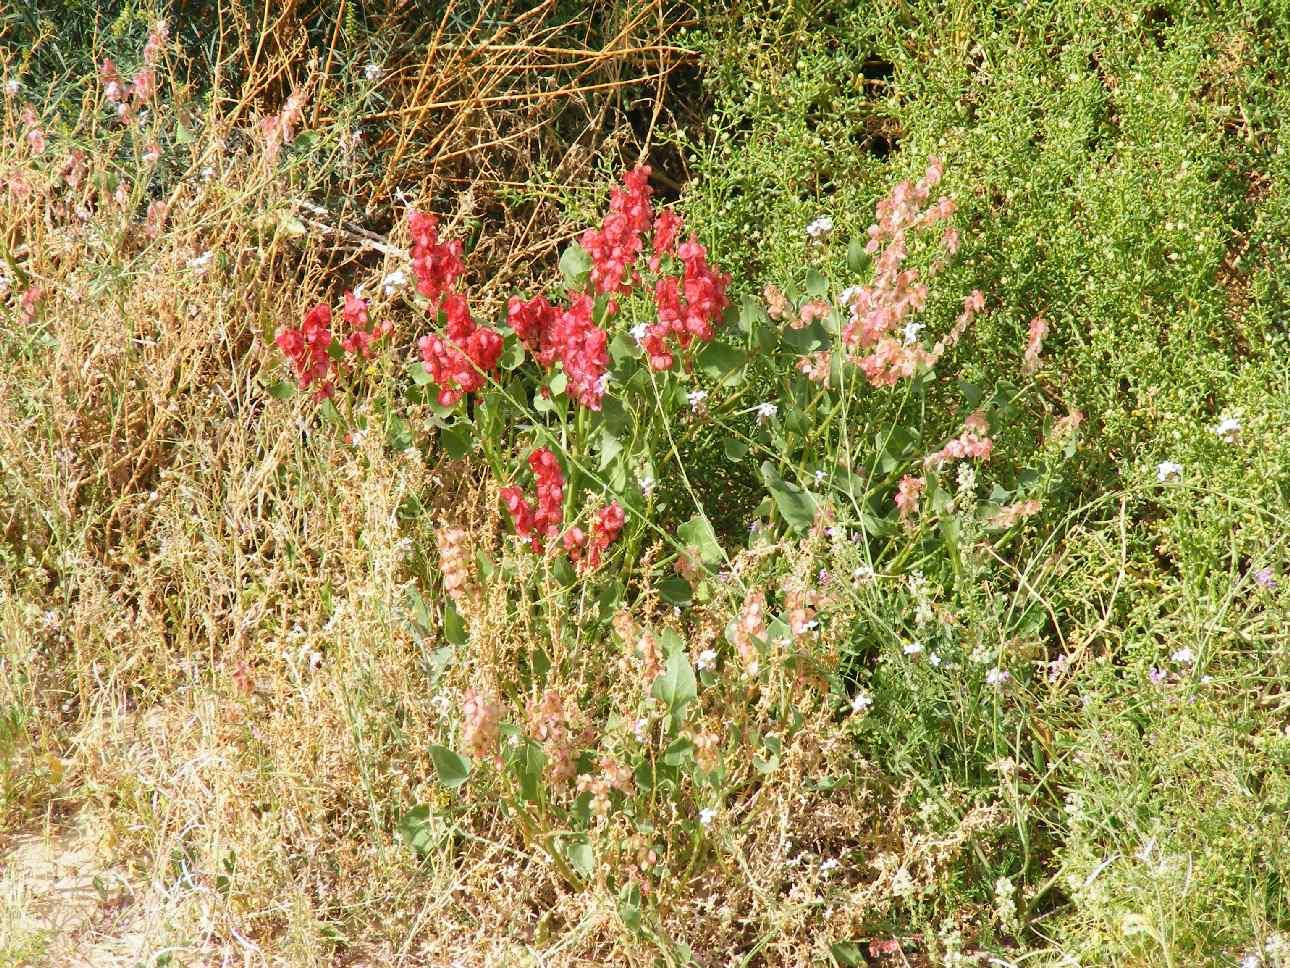 Desert bloom emulating northern meadow, Arava 2013